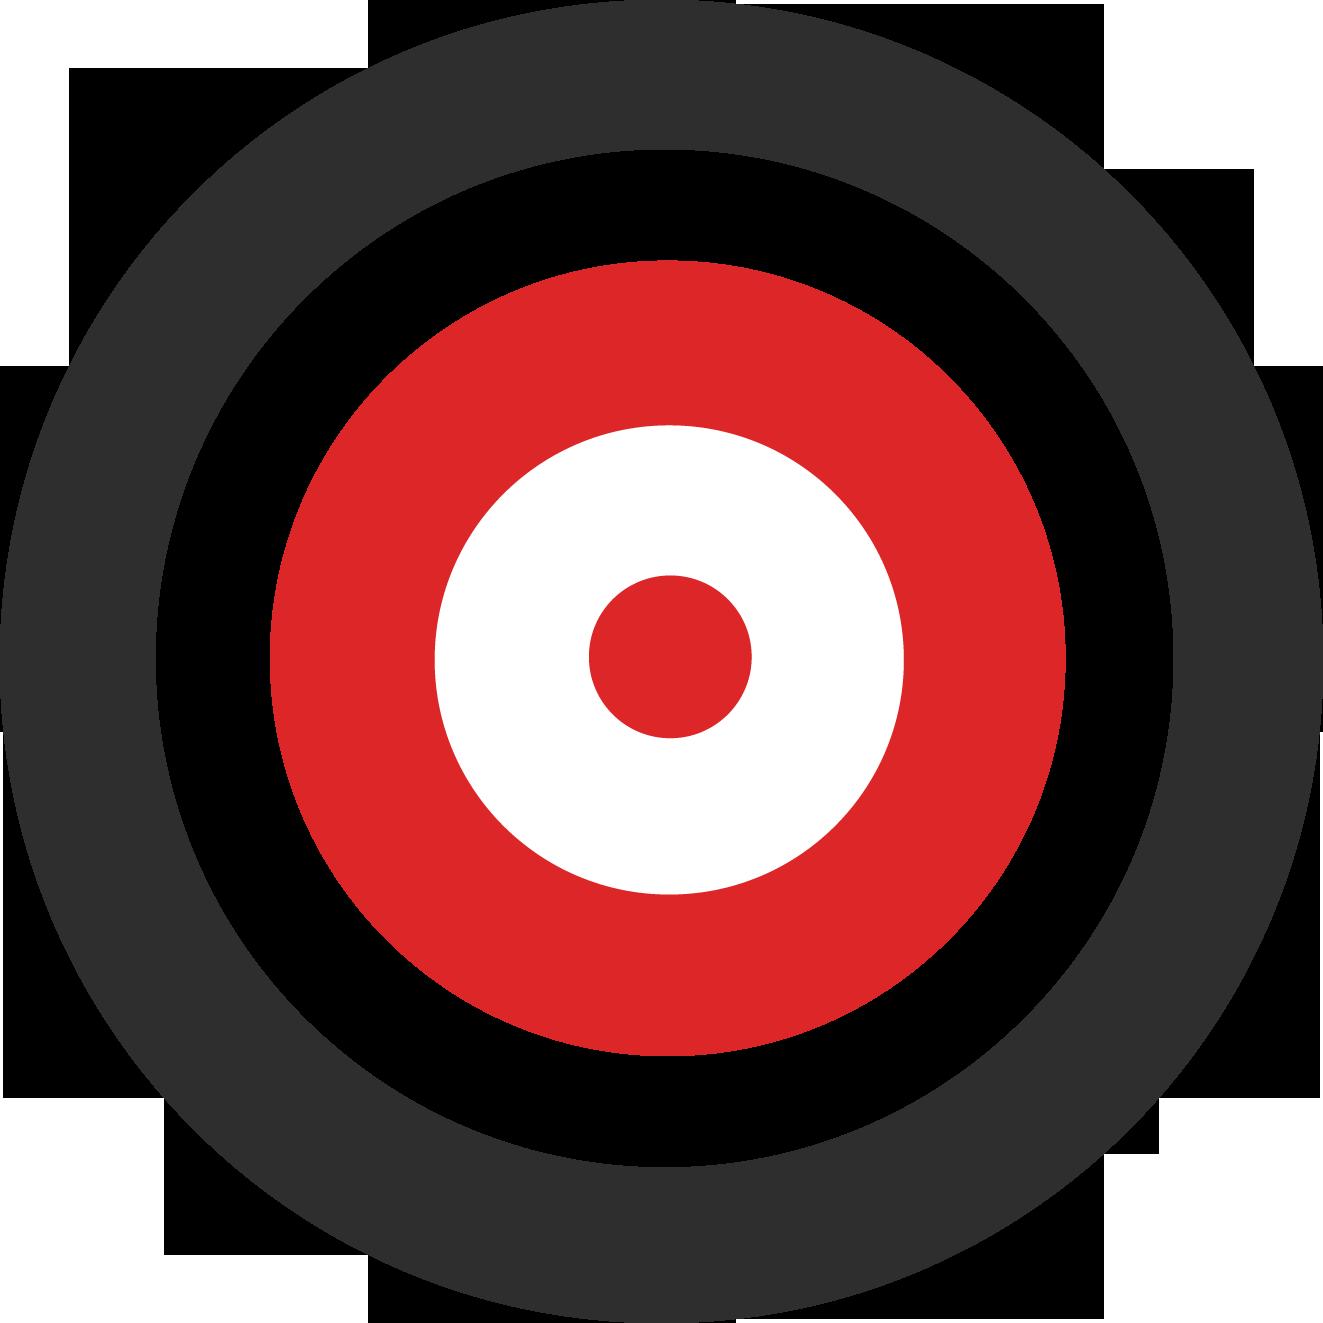 Target PNG - 2785